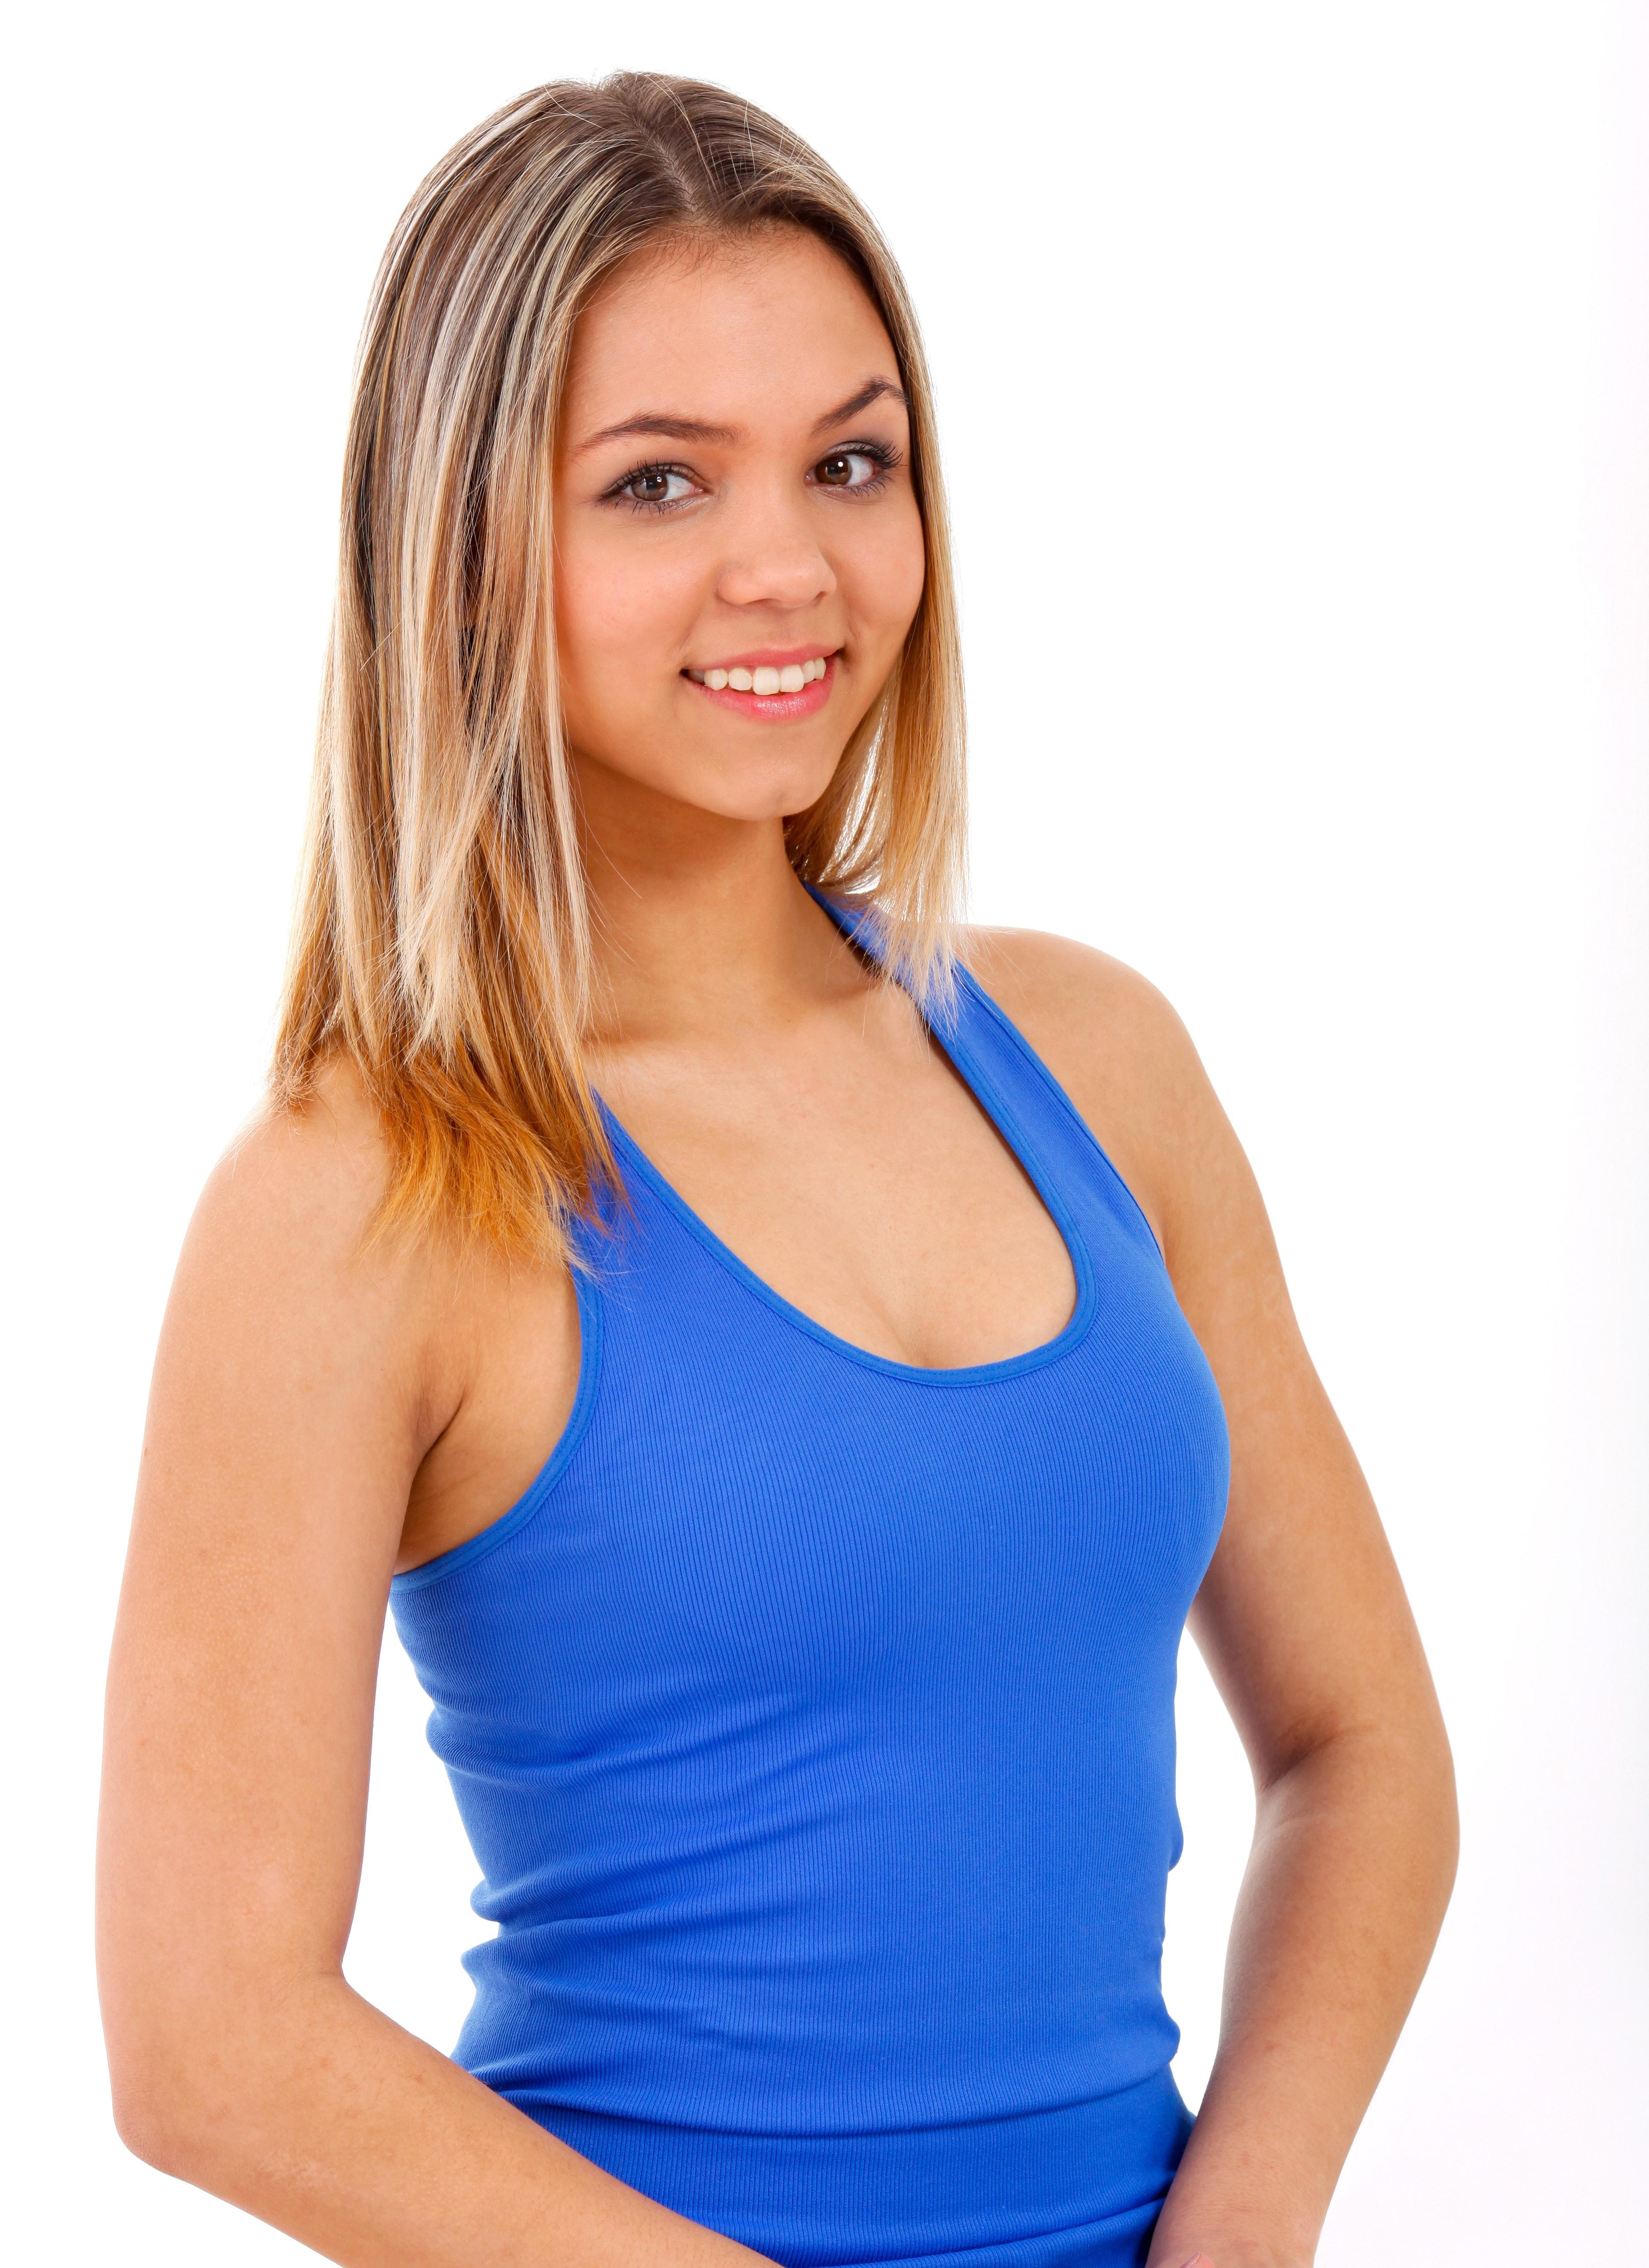 Woman Smiling While Wearing Blue Tank Top, Beautiful, Casual, Cute, Female, HQ Photo